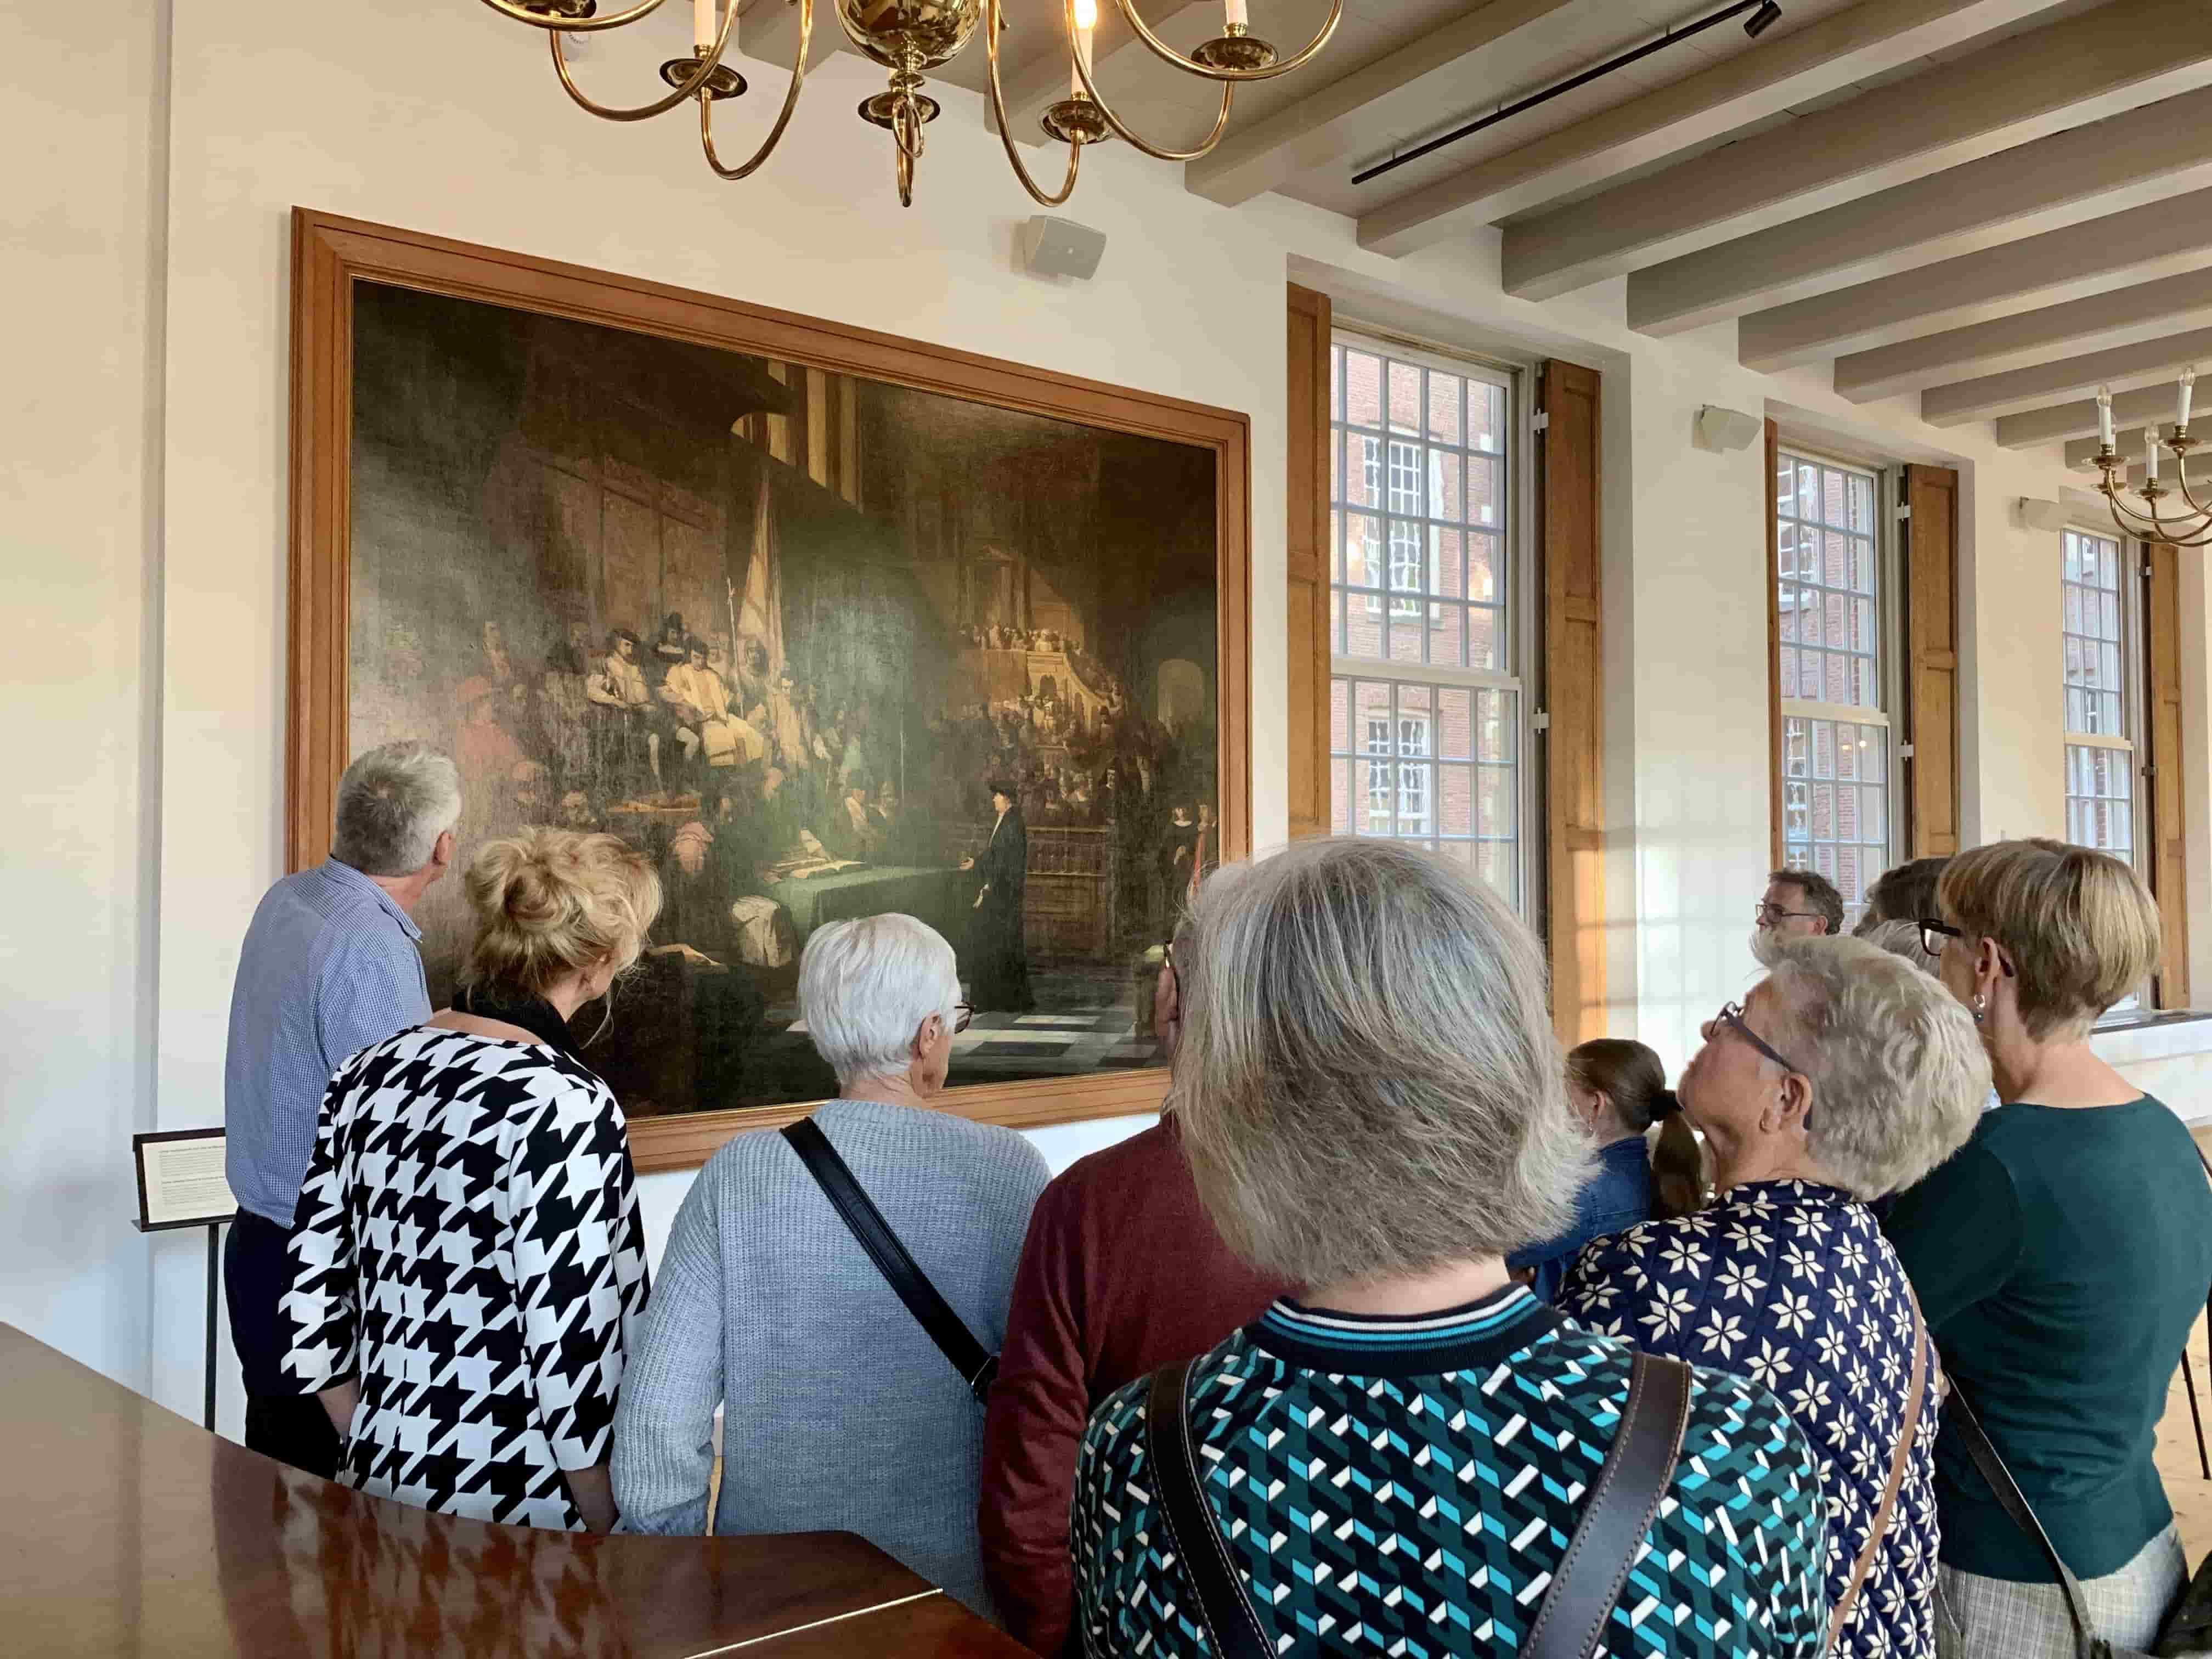 Luthermuseum Amsterdam